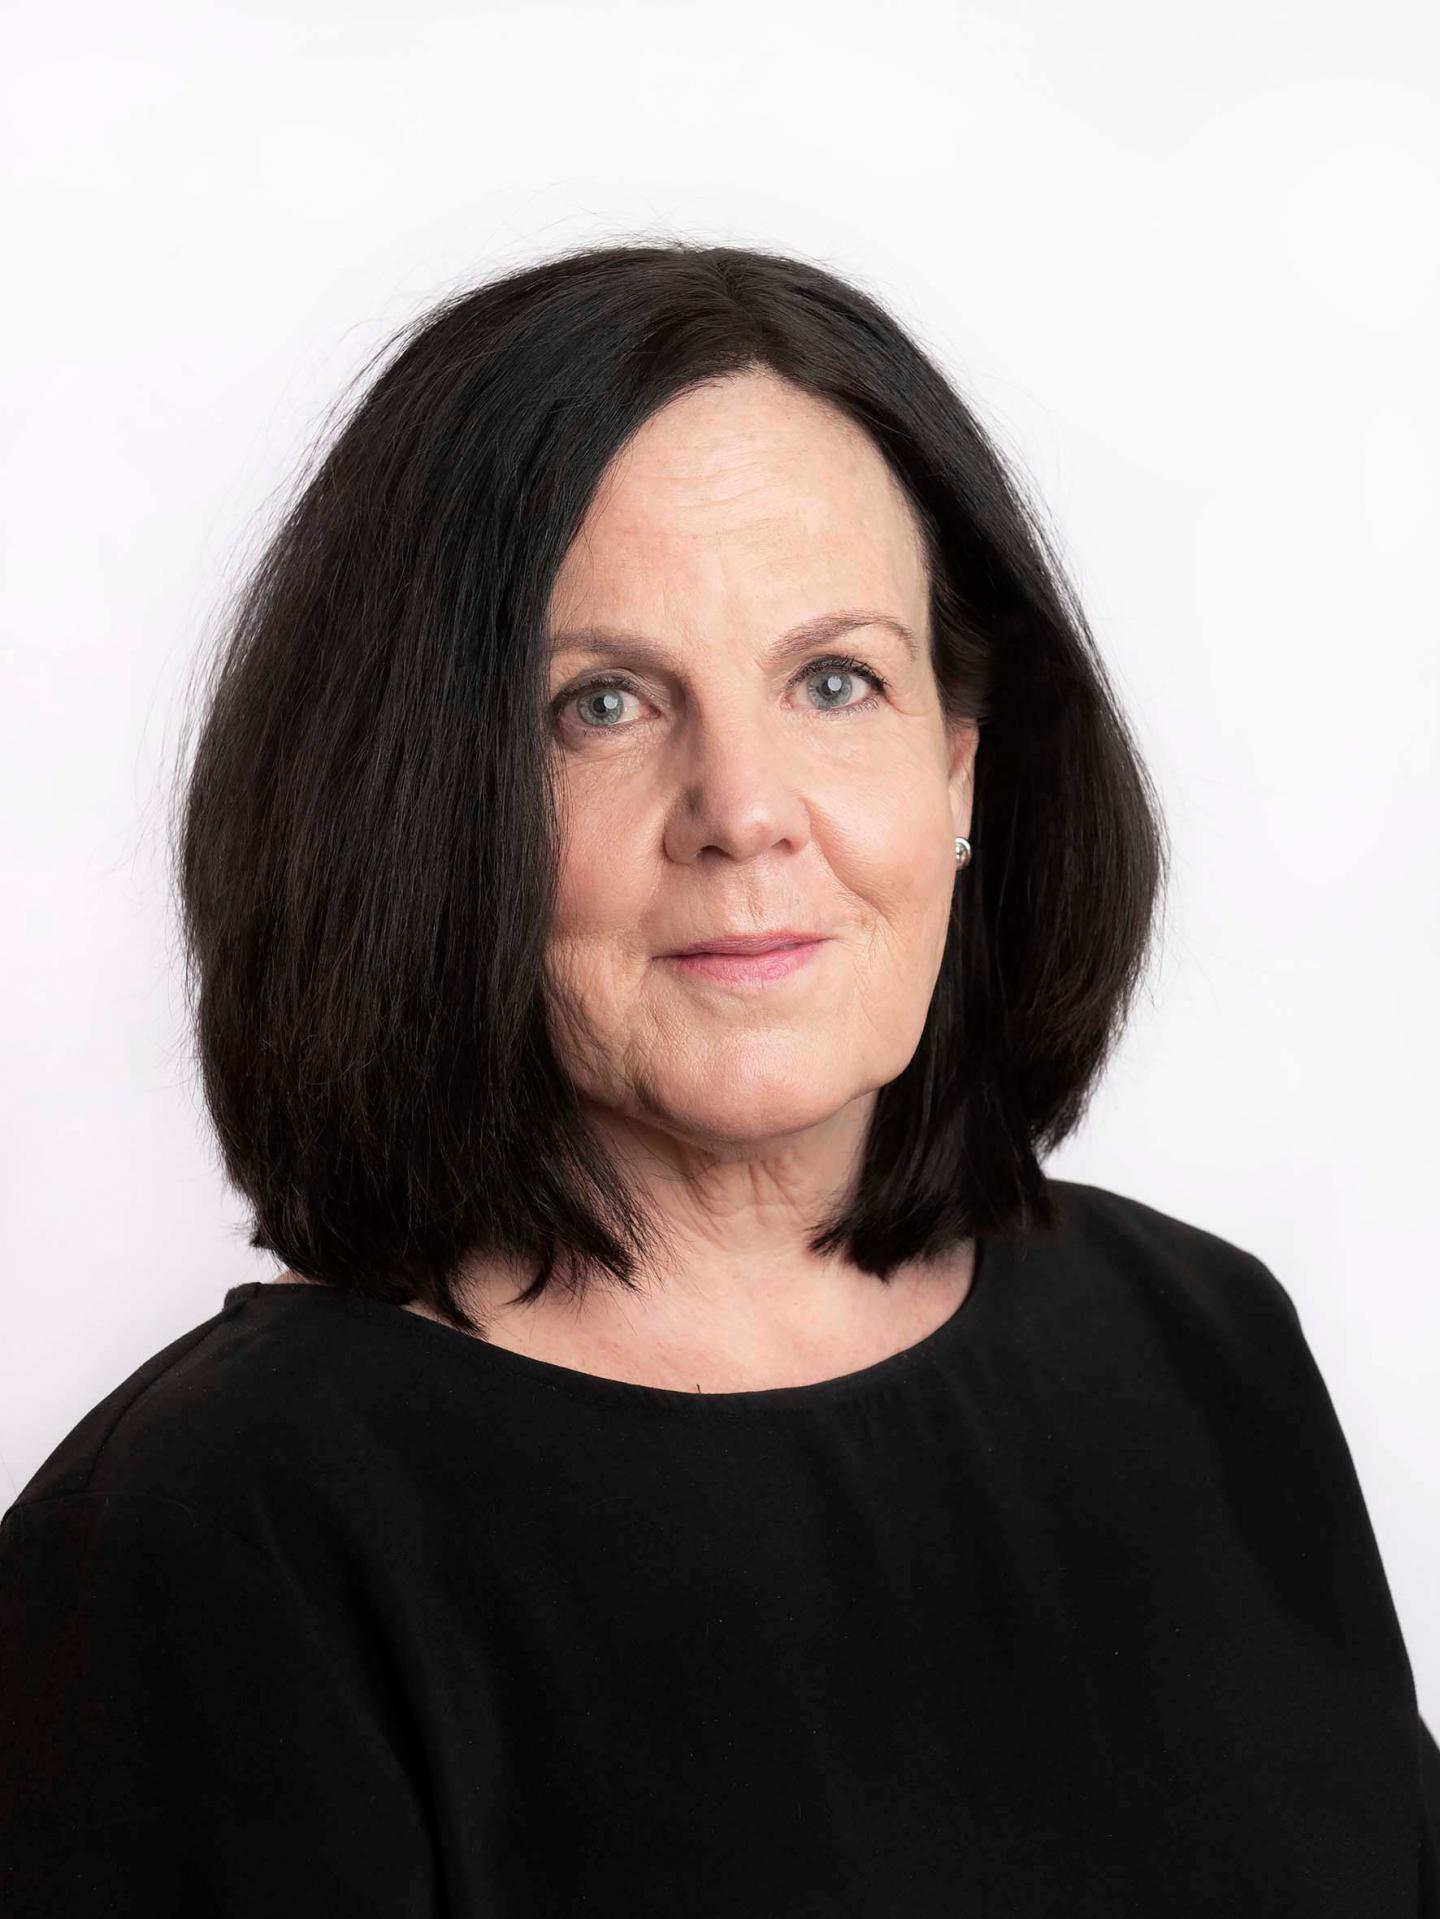 Lena Rindner